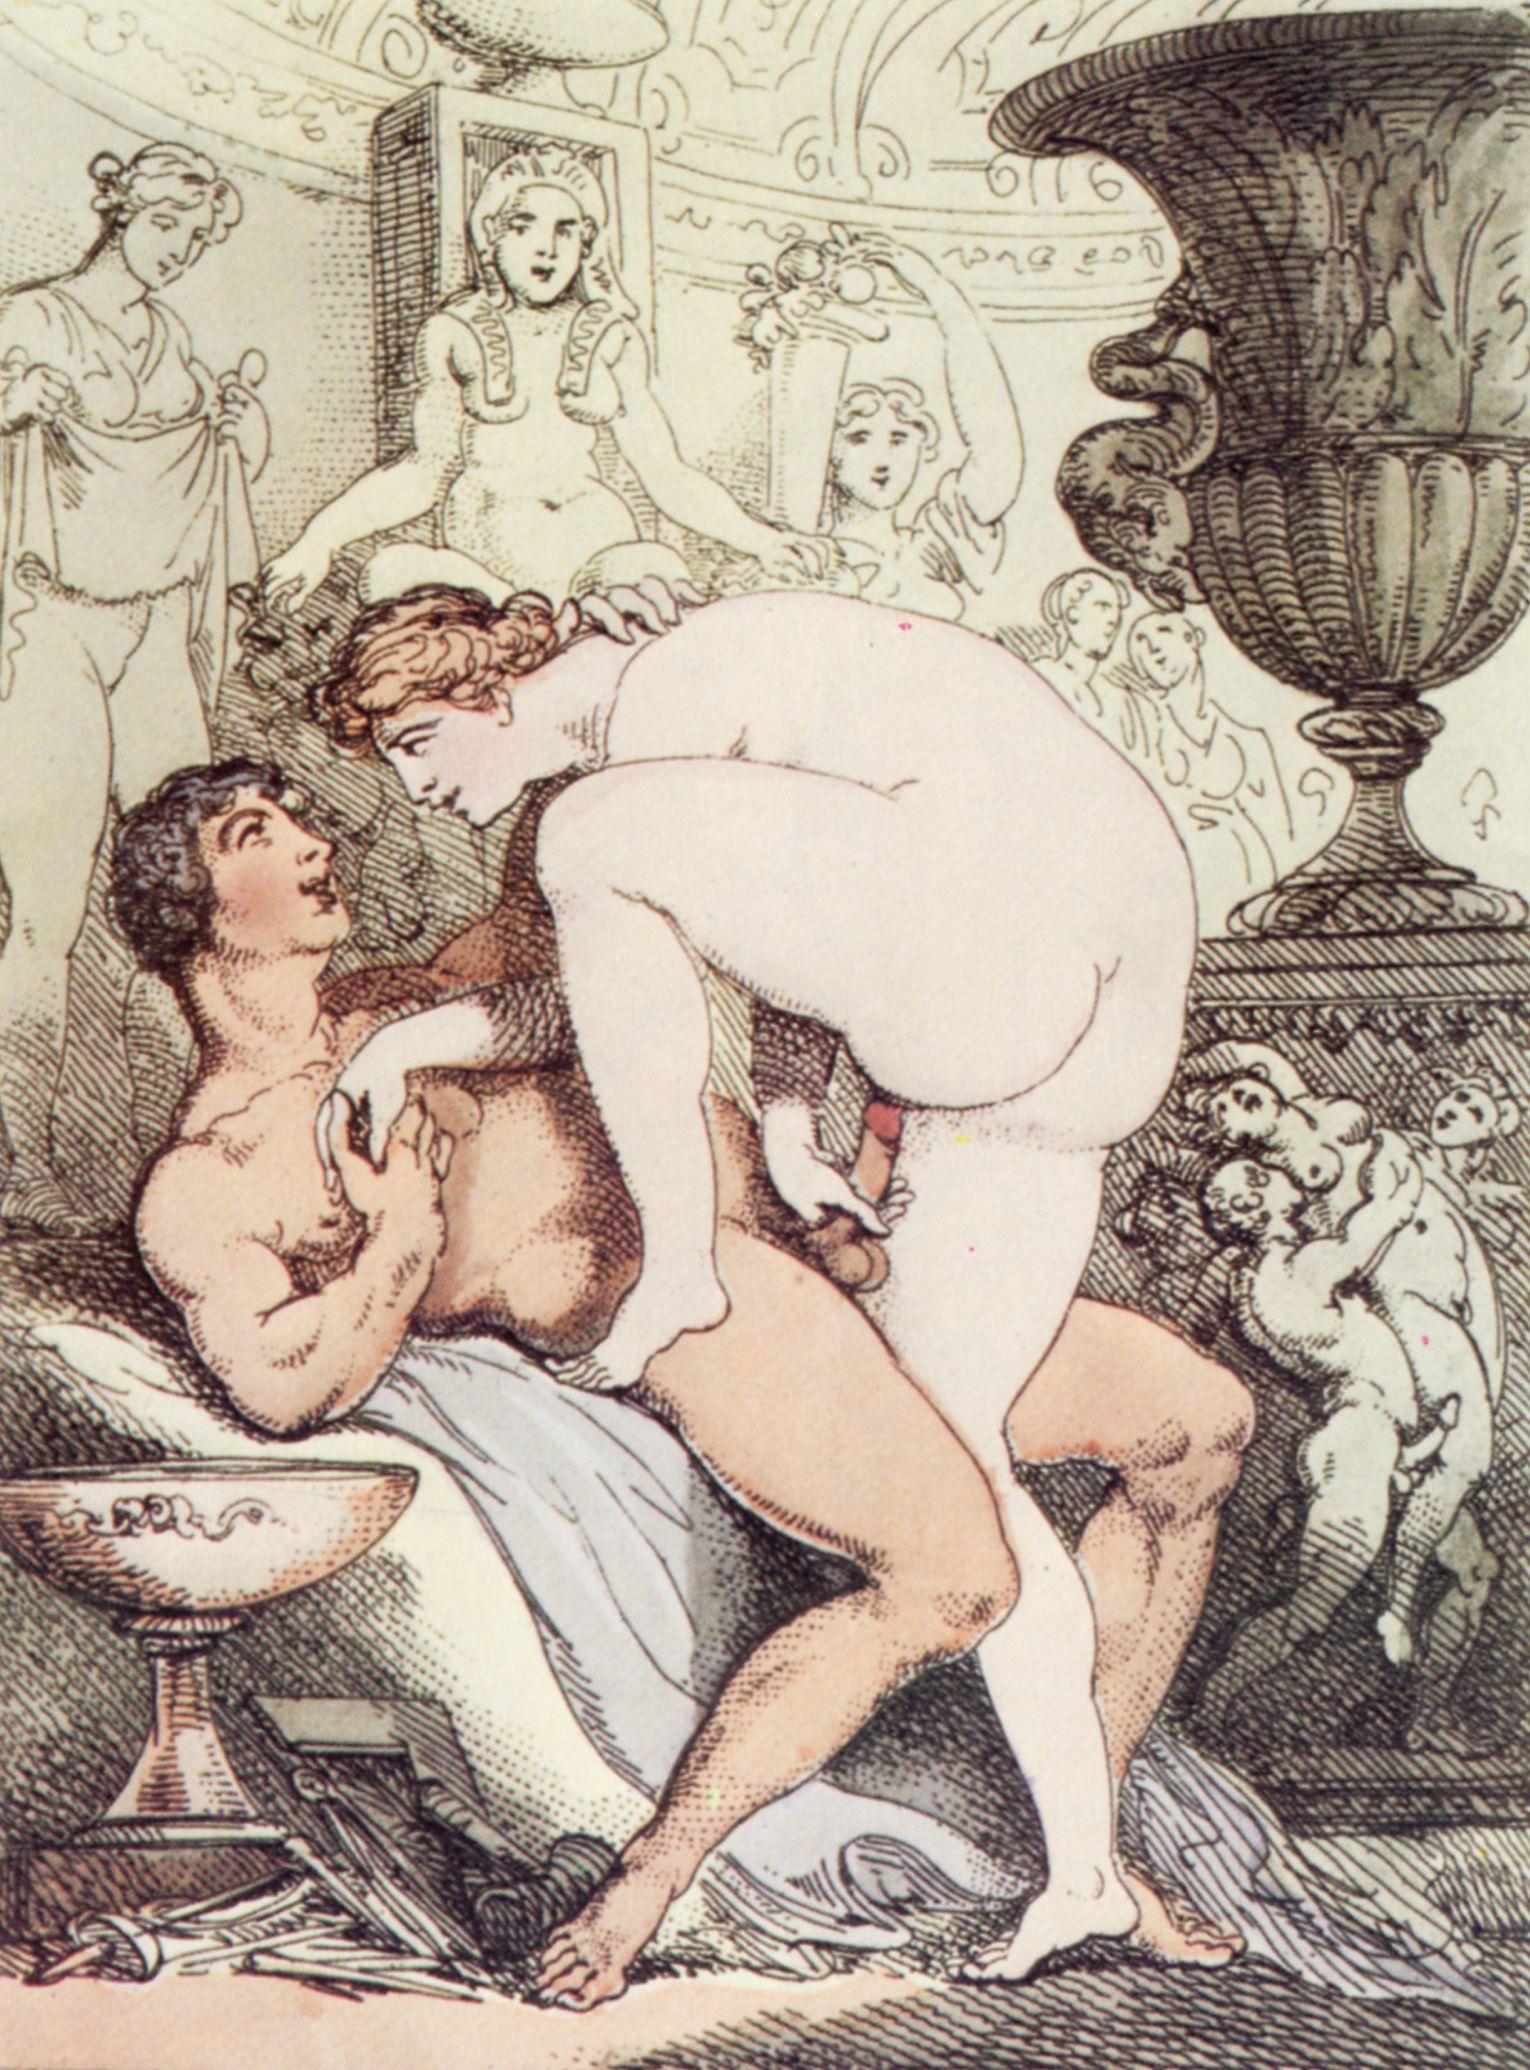 Секс рисунки 18 века 1 фотография